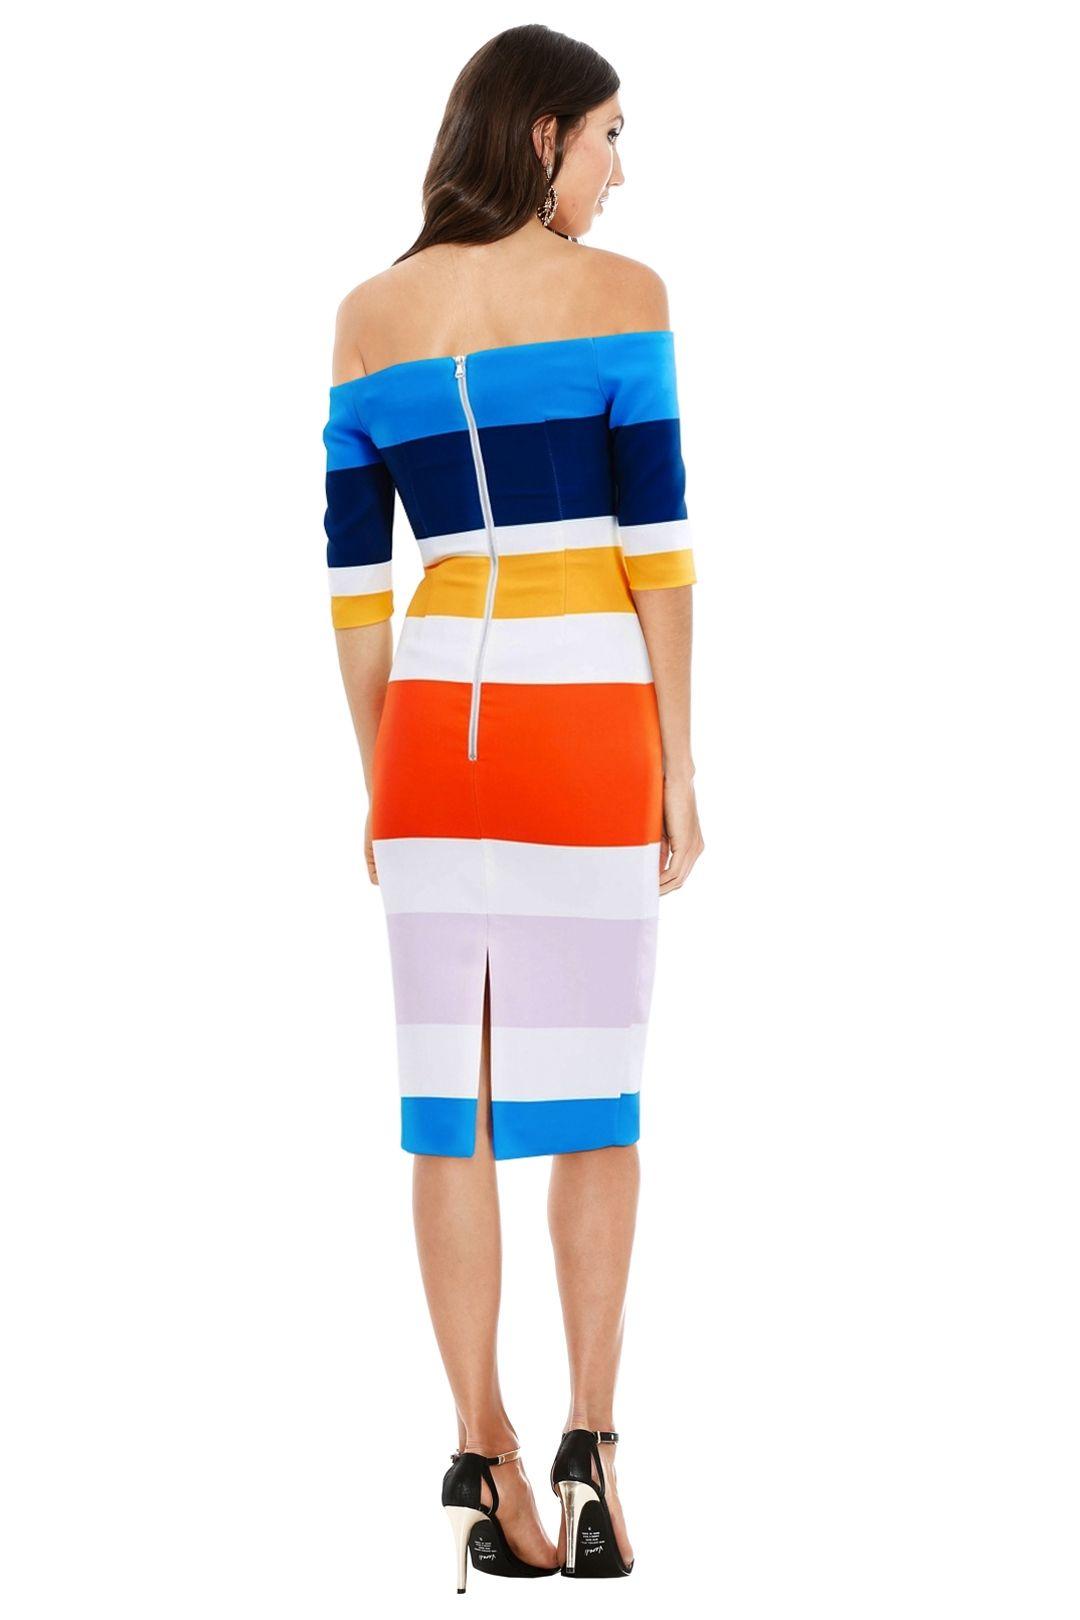 By Johnny - Bermuda Stripe Cut Off Dress - Multicolour - Back